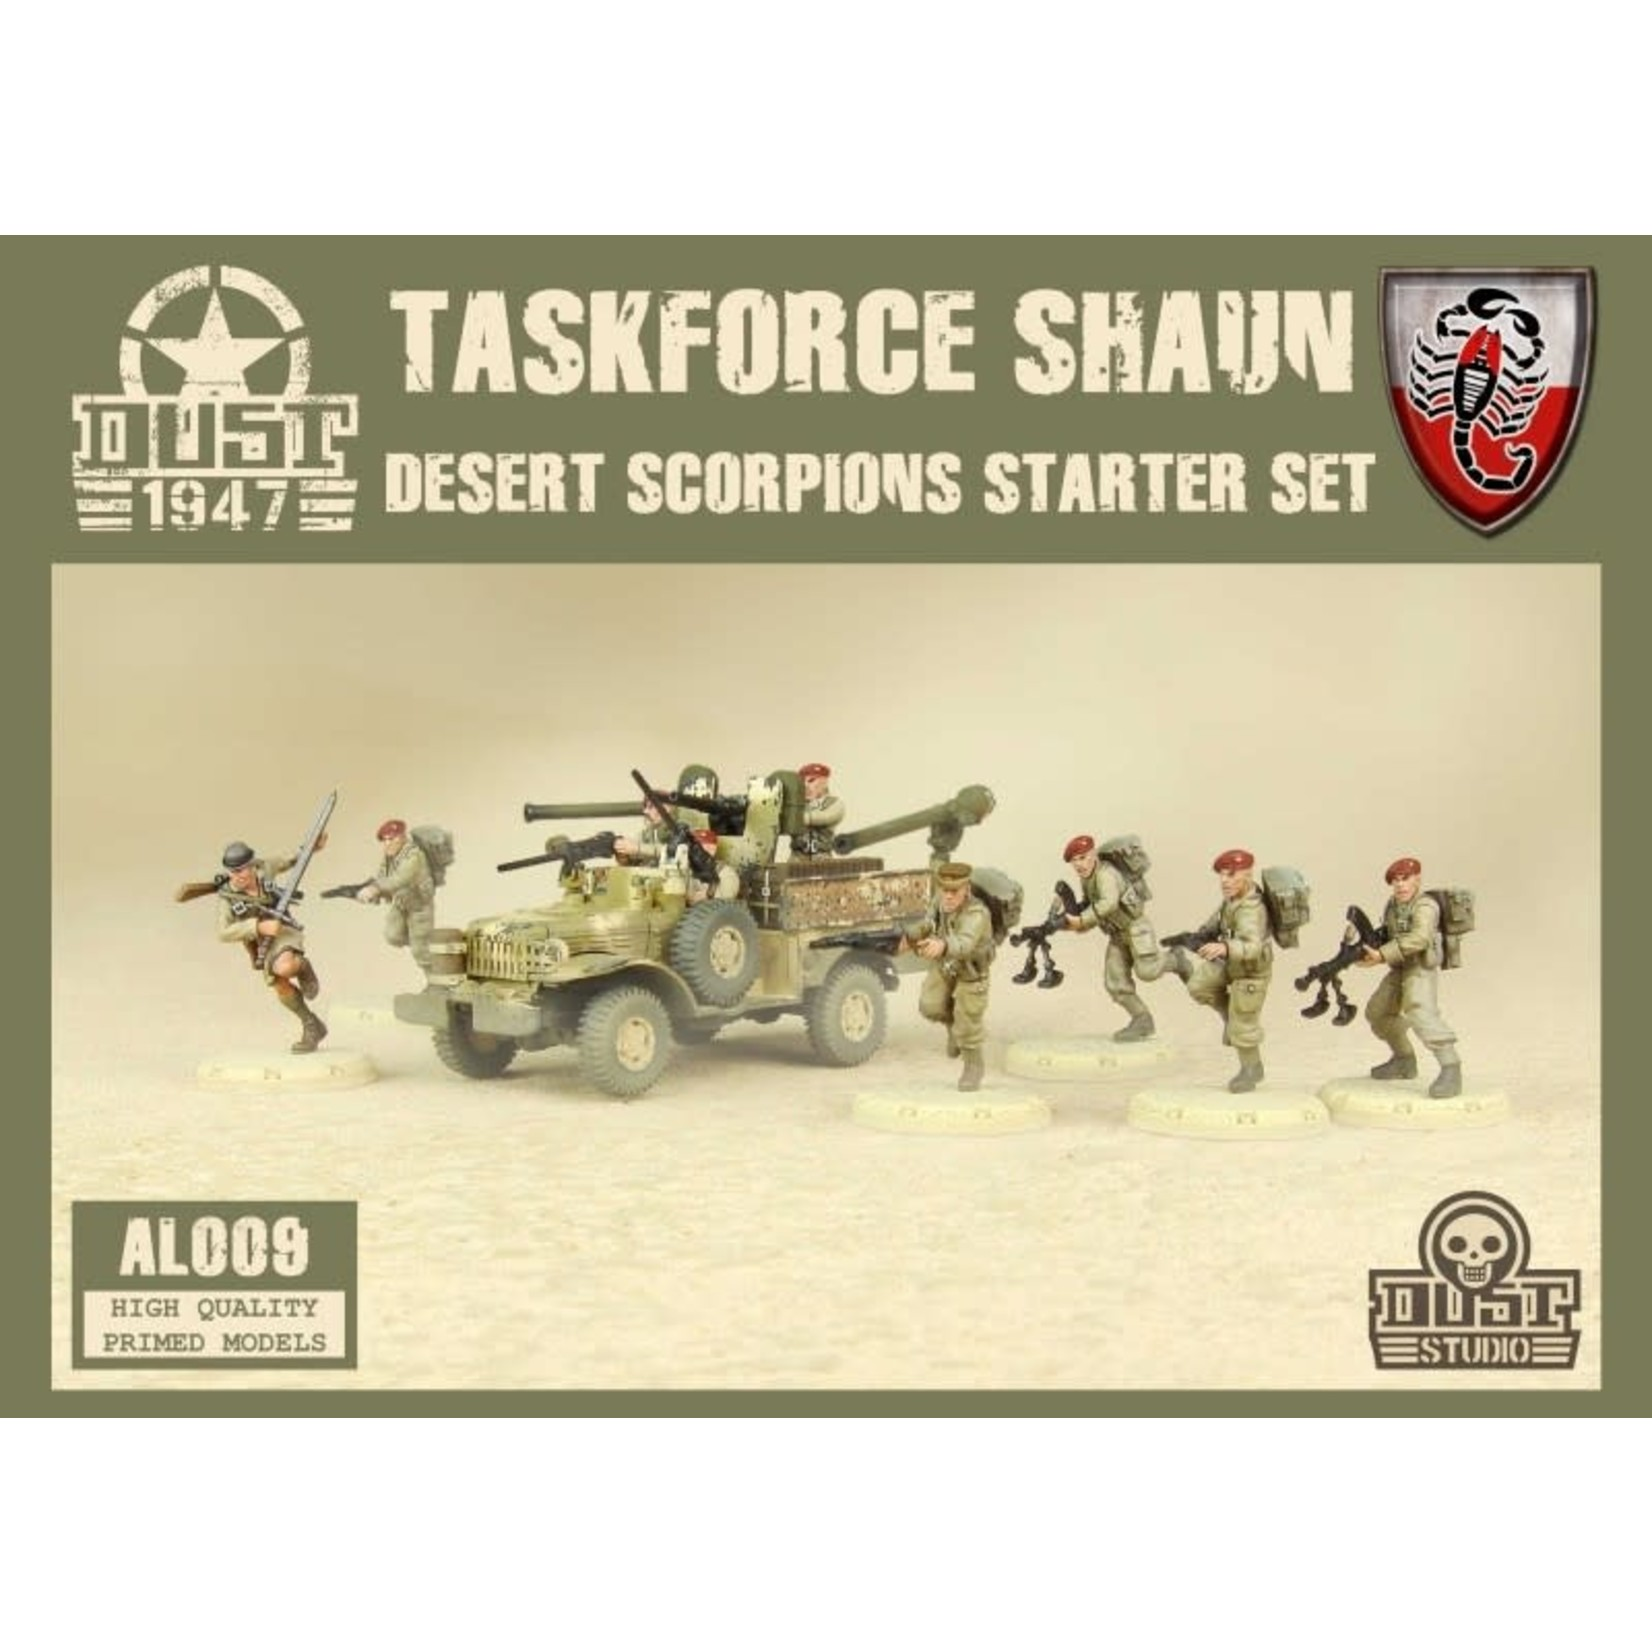 Dust Dust 1947: Desert Scorpions Starter - Taskforce Shaun